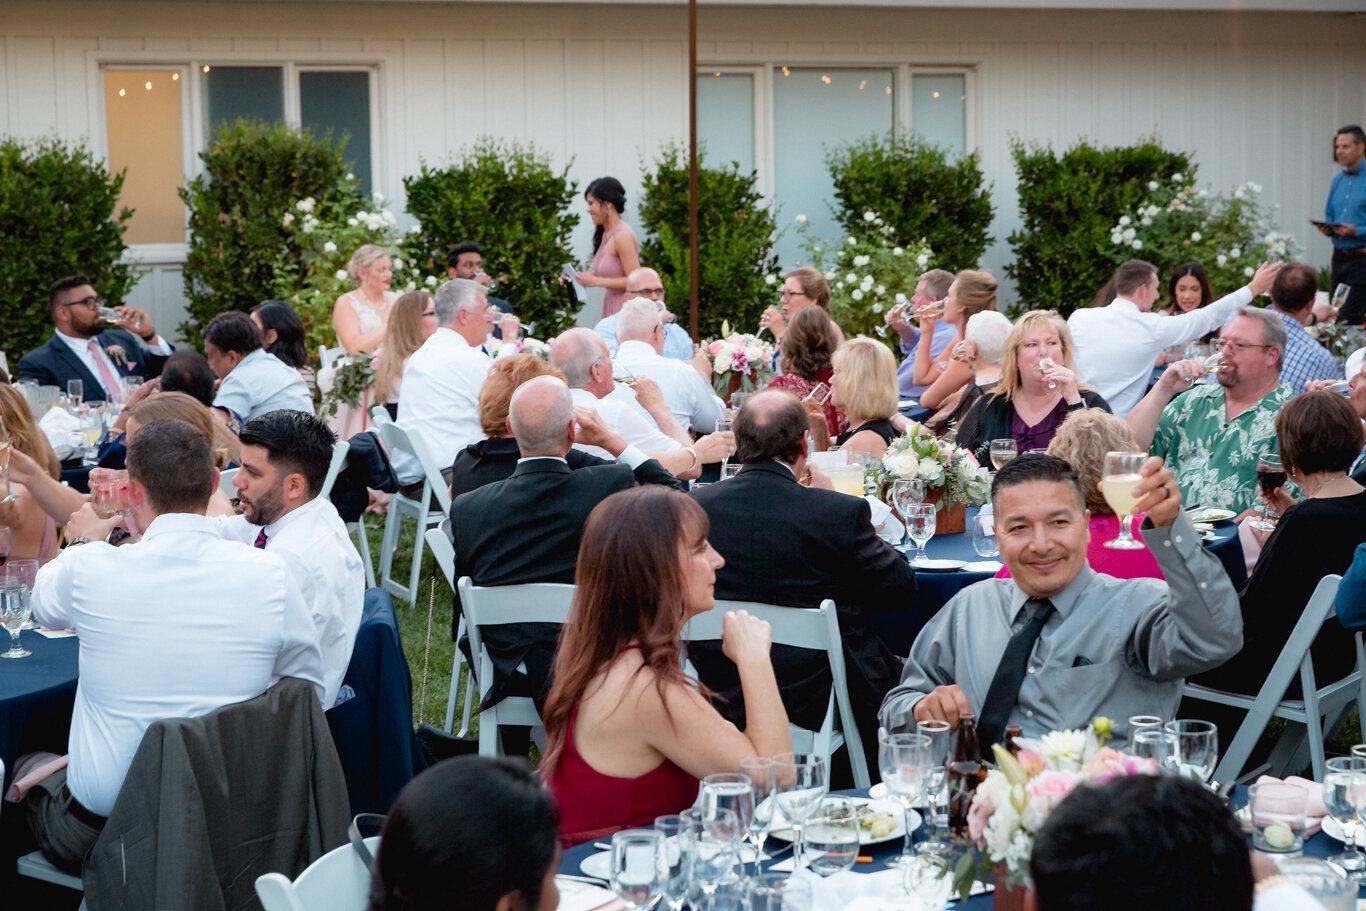 2019.08.24_Emily-Ashir-Wedding-at-the-Maples-6308.jpg